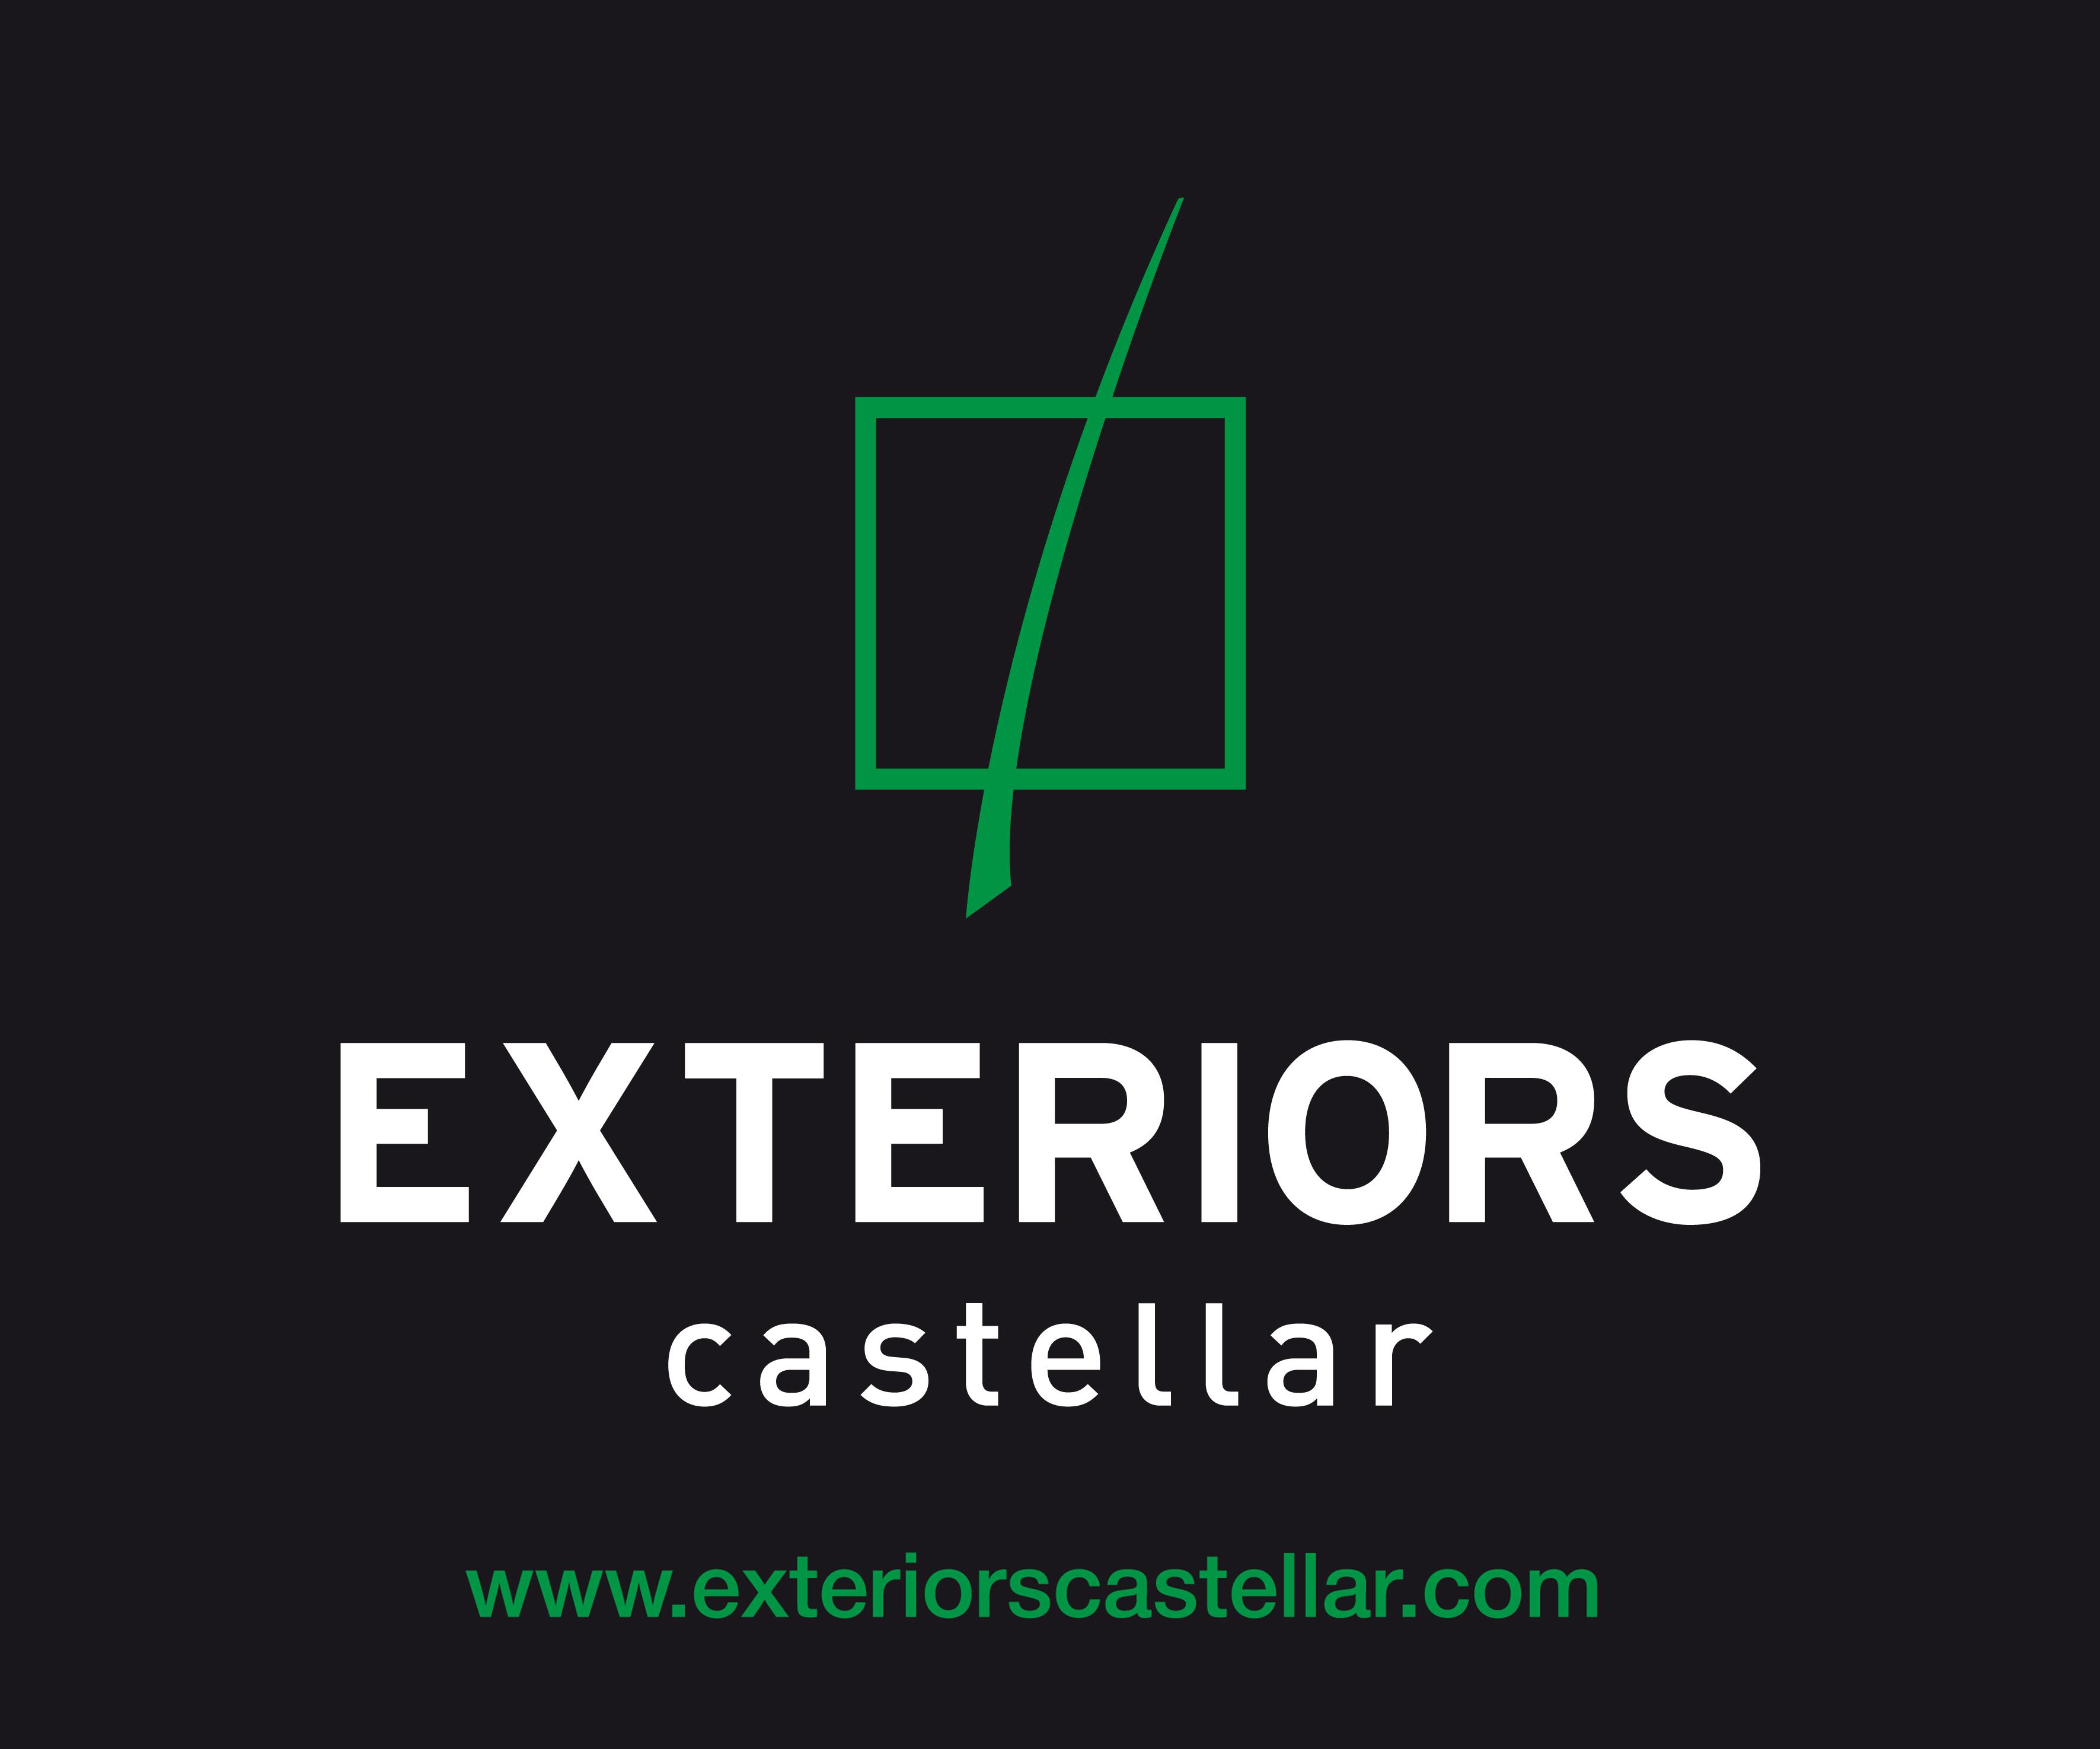 Exteriors Castellar